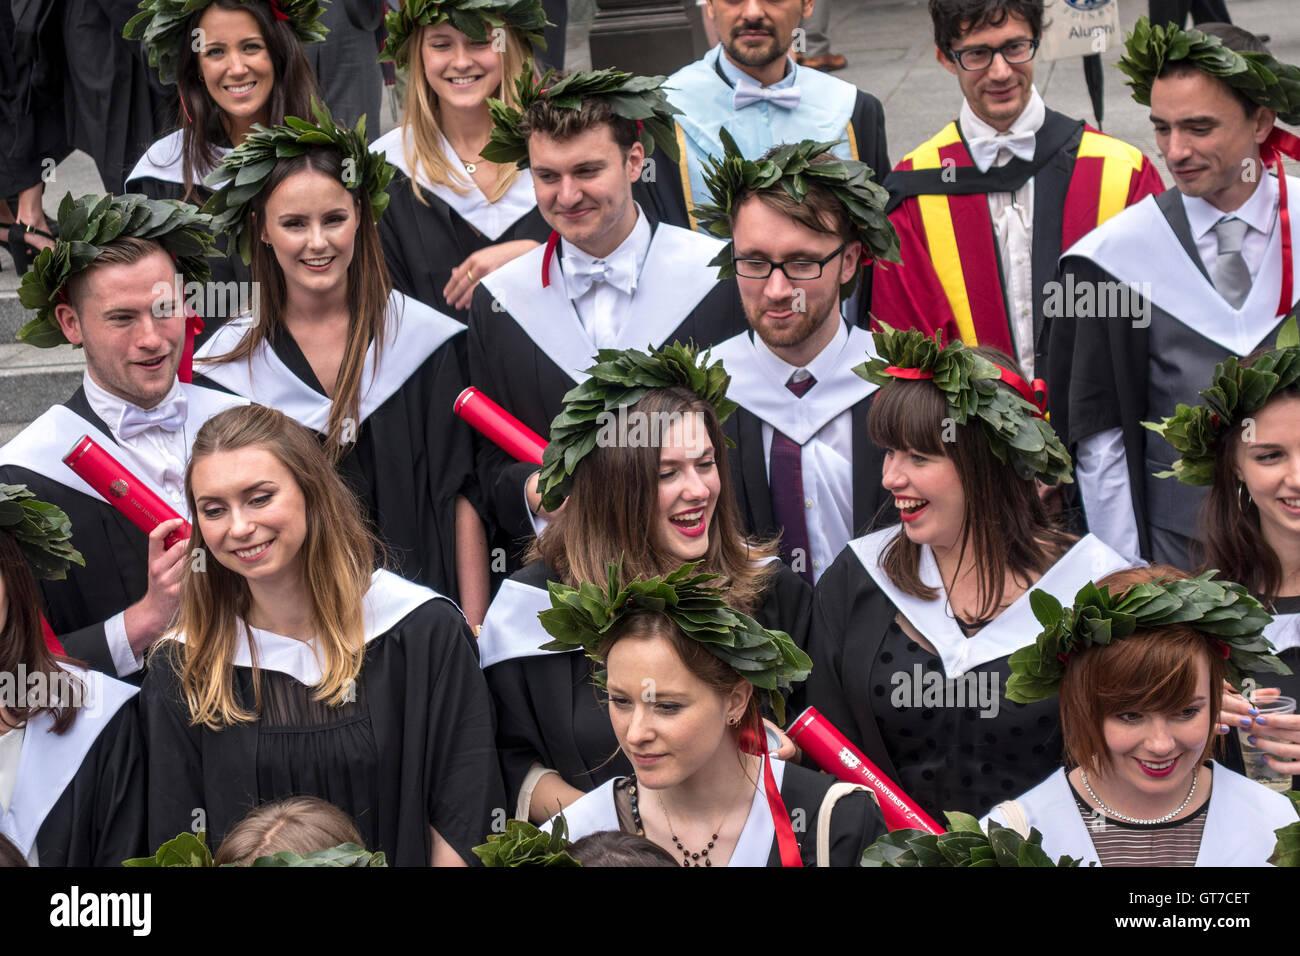 http://c7.alamy.com/comp/GT7CET/edinburgh-university-graduation-day-happy-graduating-students-wearing-GT7CET.jpg